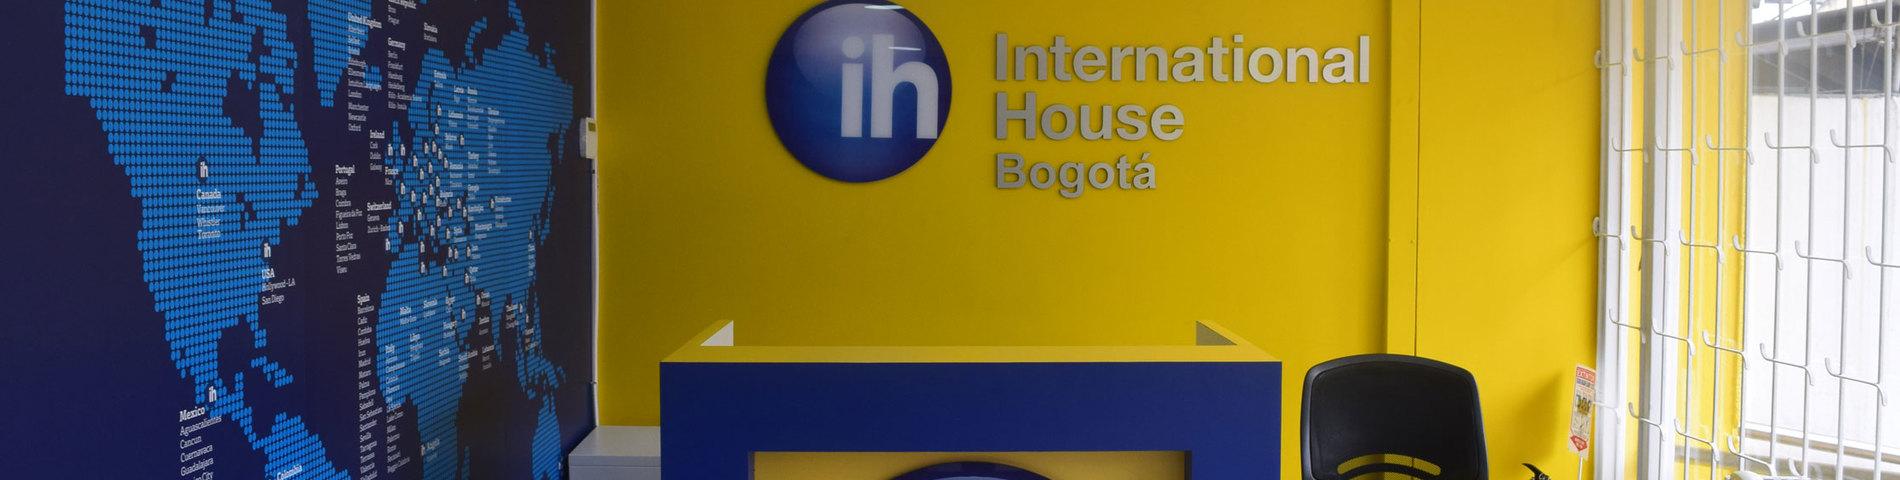 Imatge 1 de l'escola International House Bogota